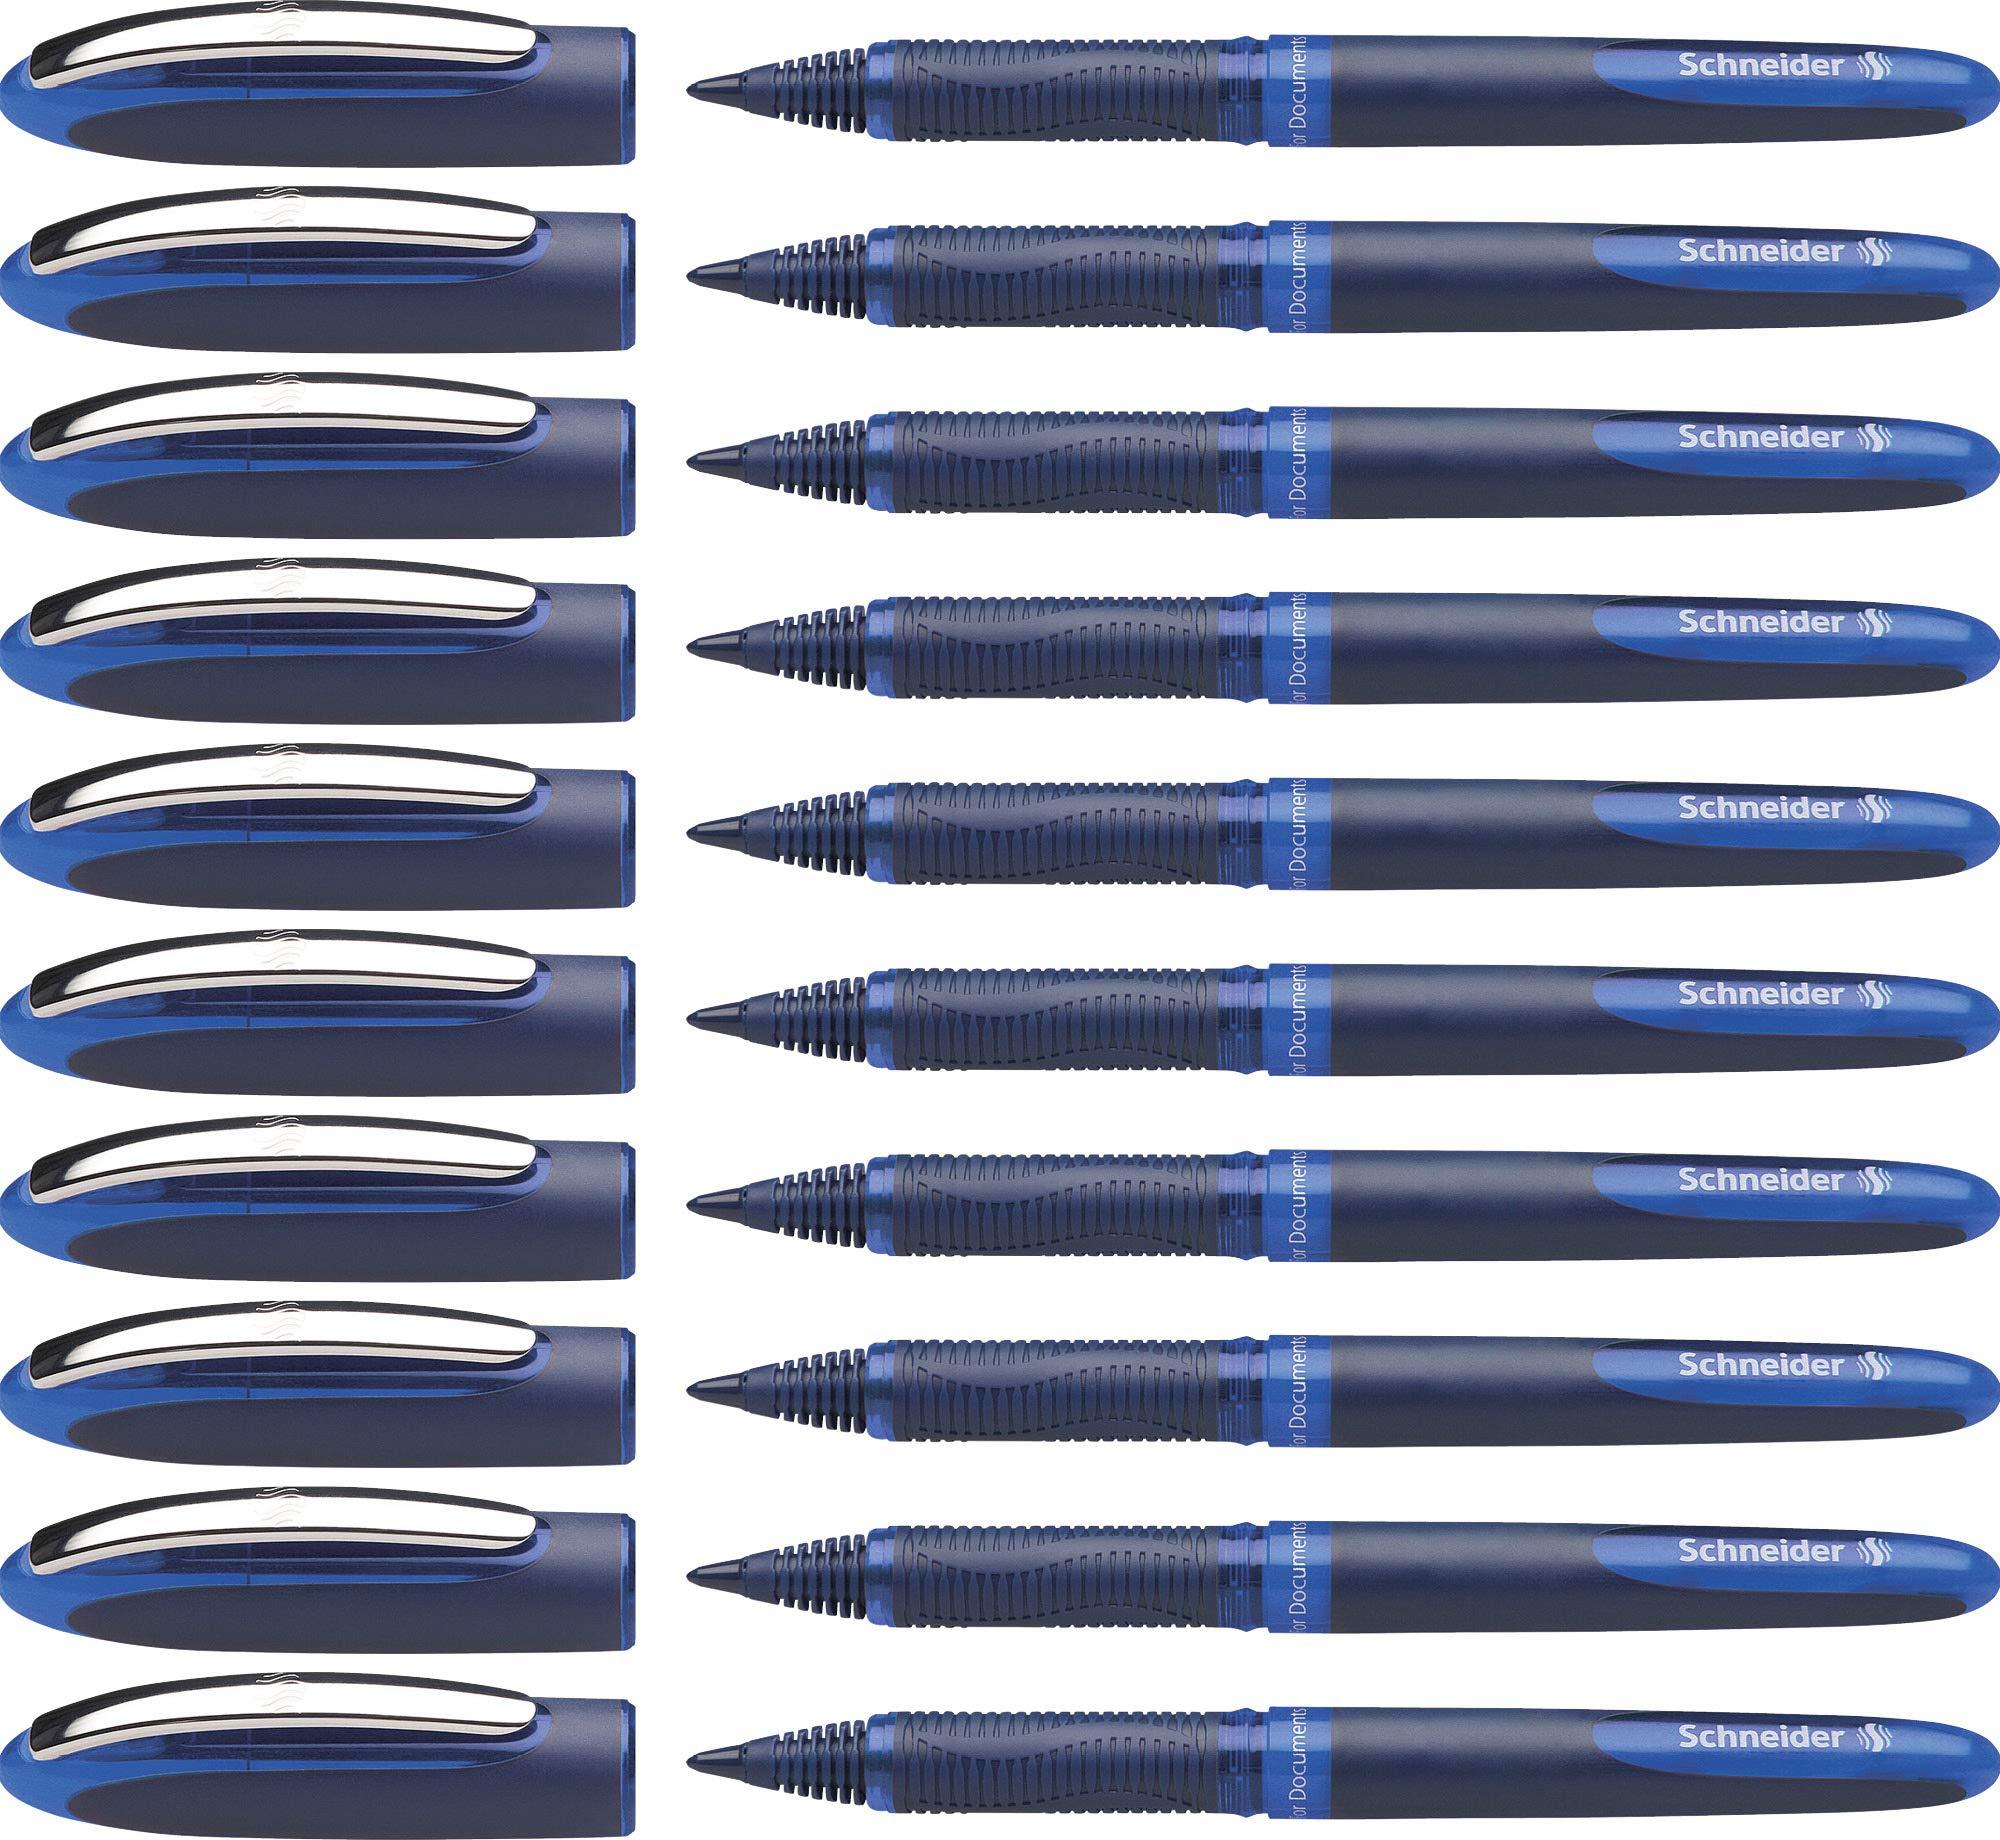 Schneider ONE Business Rollerball Pen, 0.6mm, Blue, Box of 10 (183003)